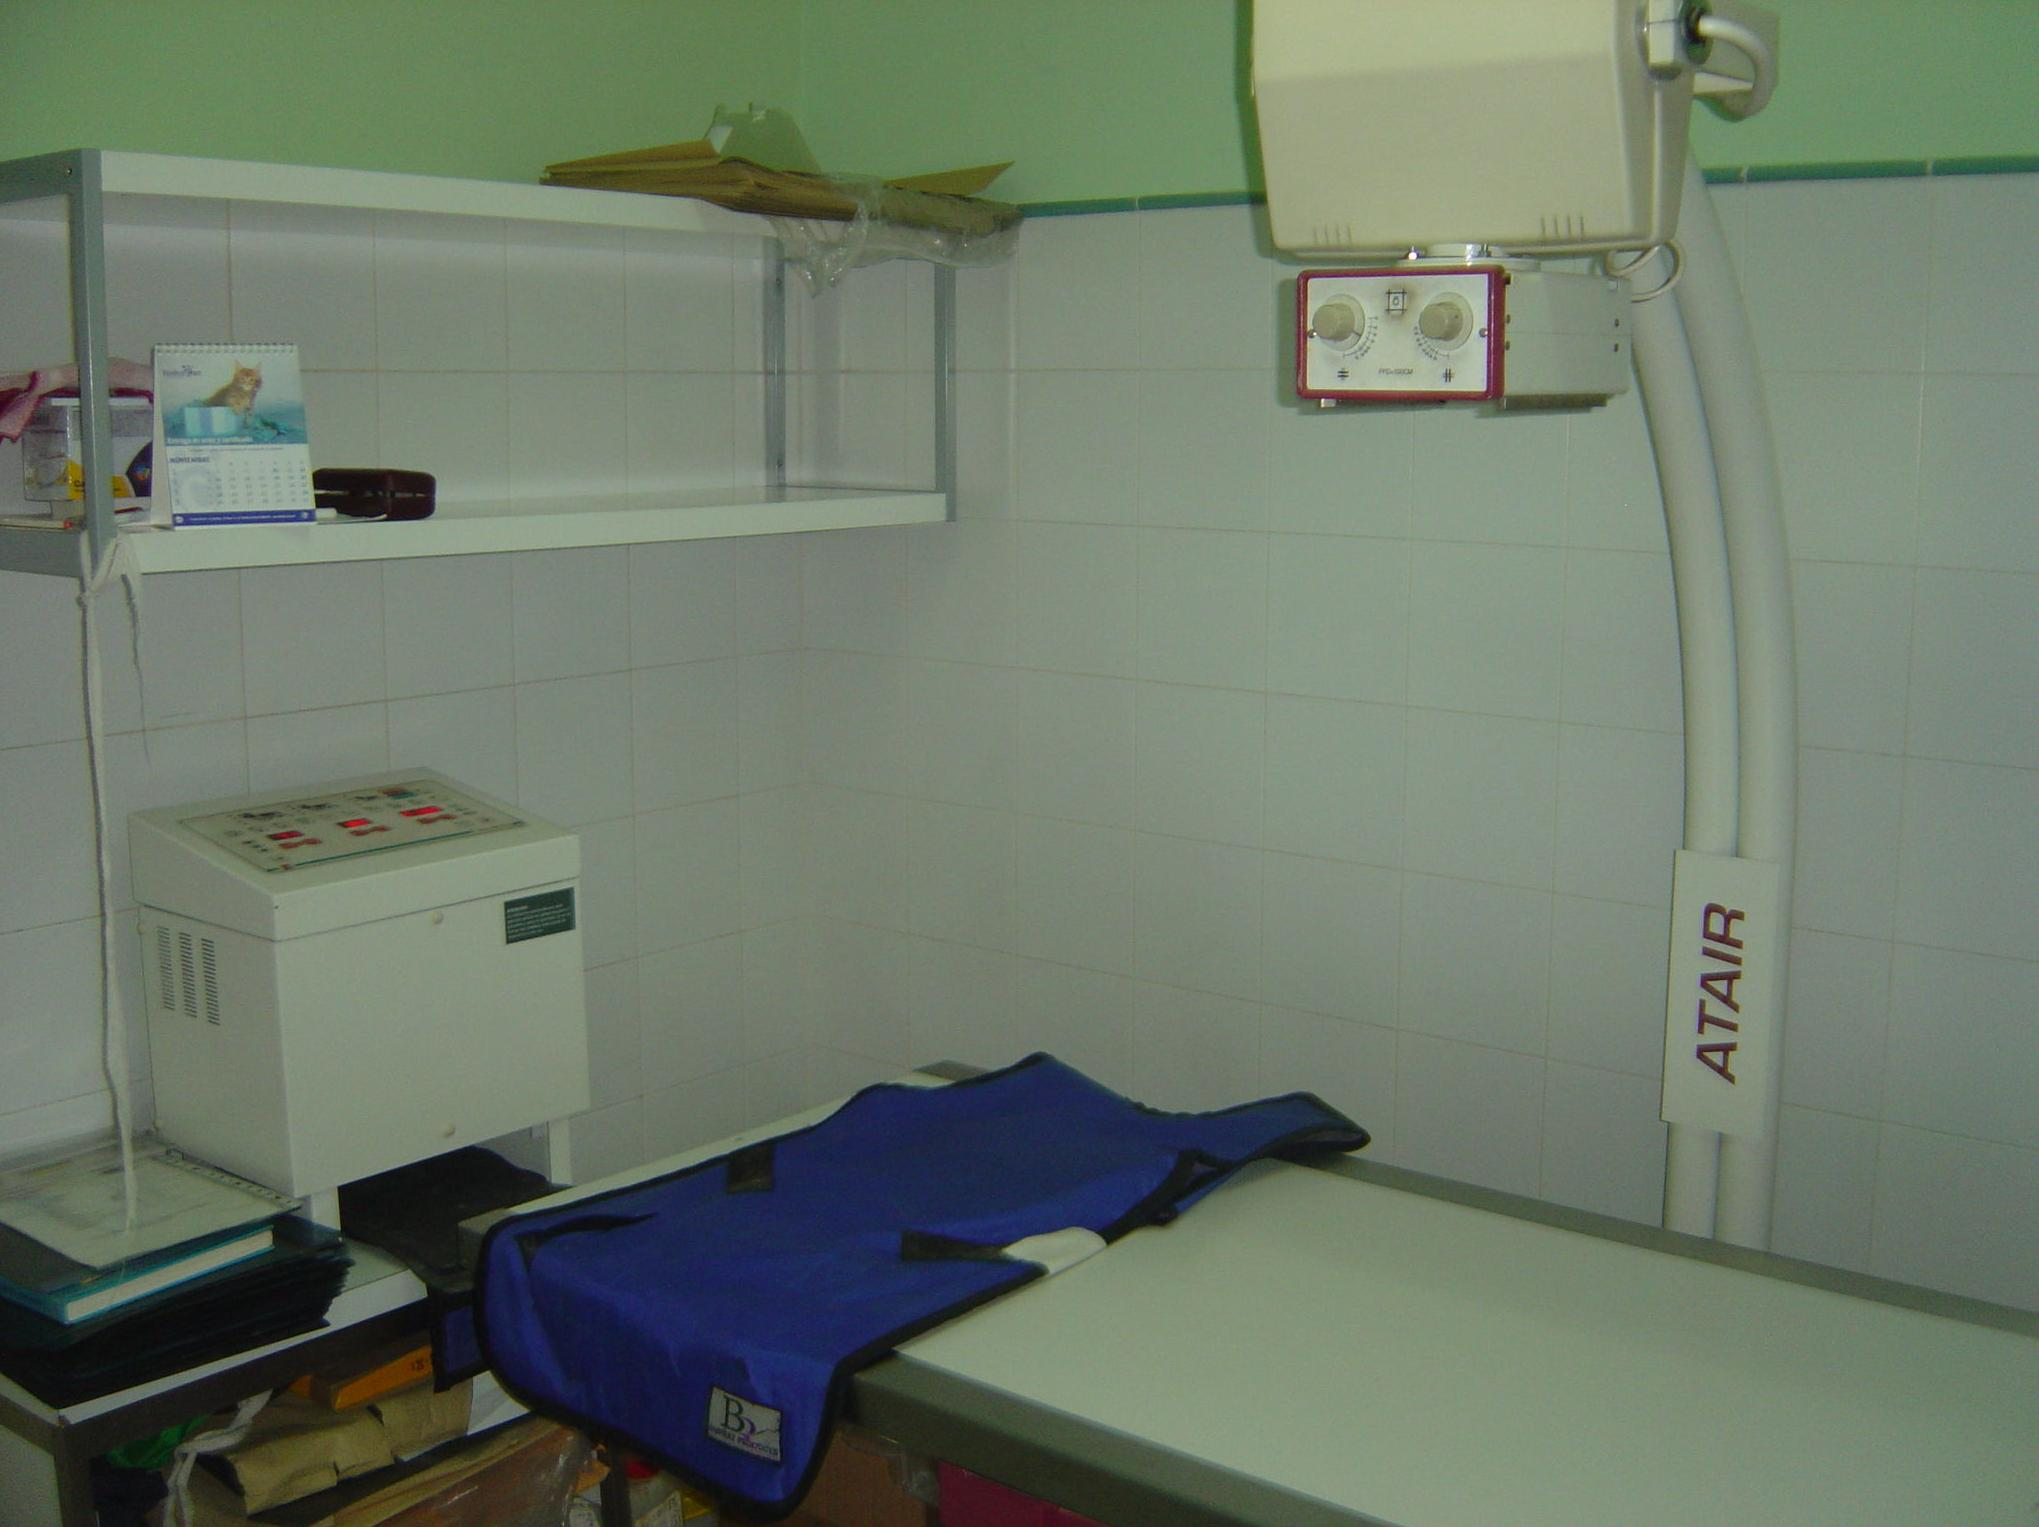 Sala de rayos X \u002D Clínica Veterinaria Albeitar \u002D Toledo